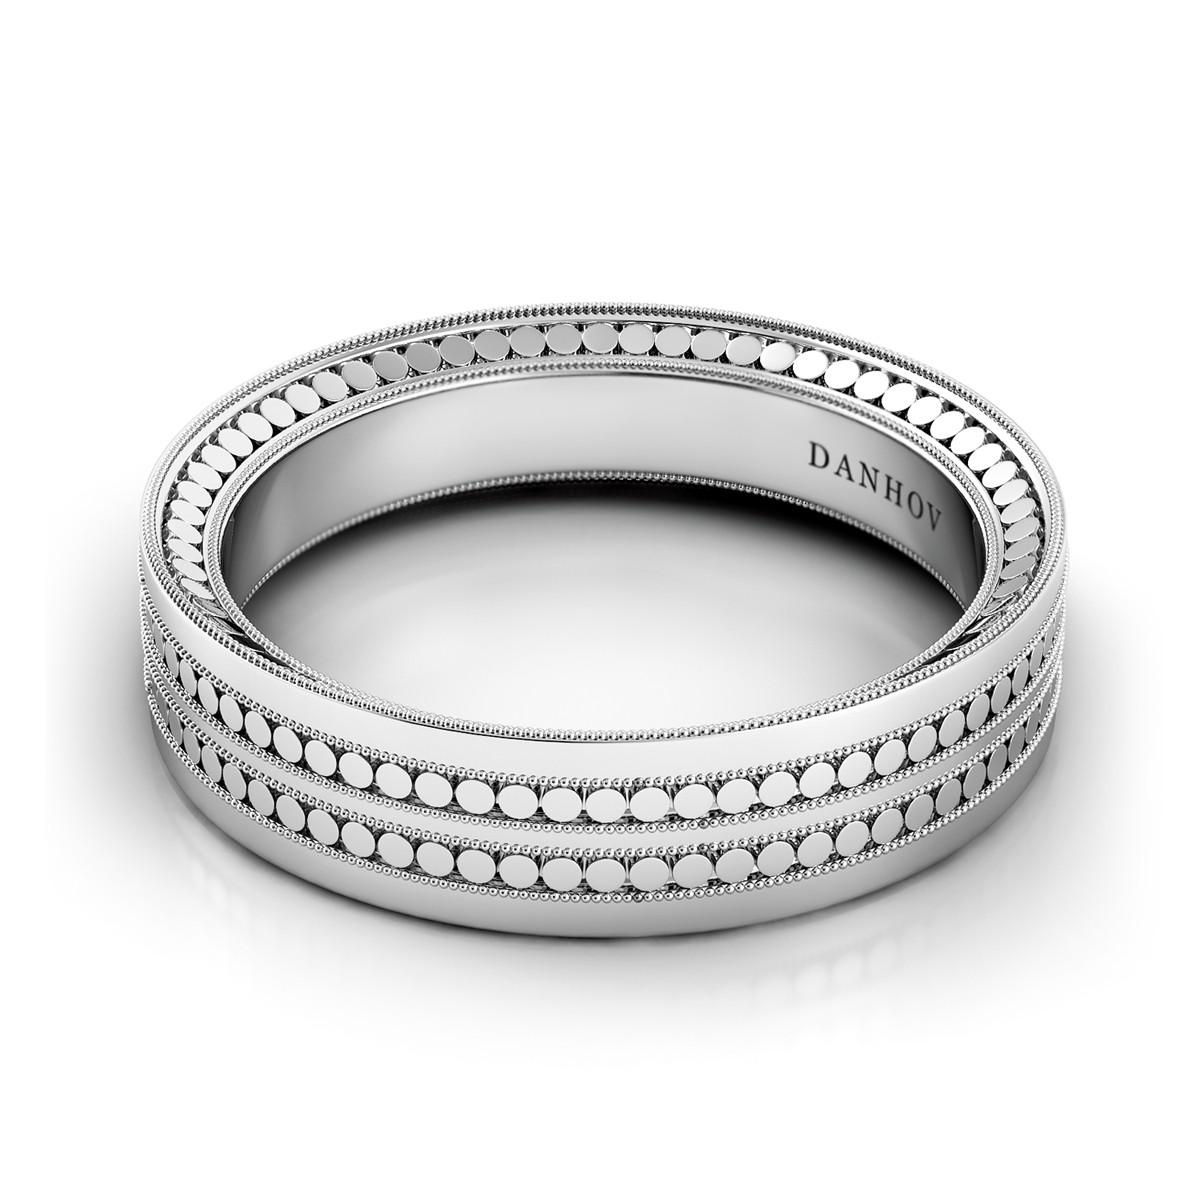 Award Winning Wedding Ring for Men